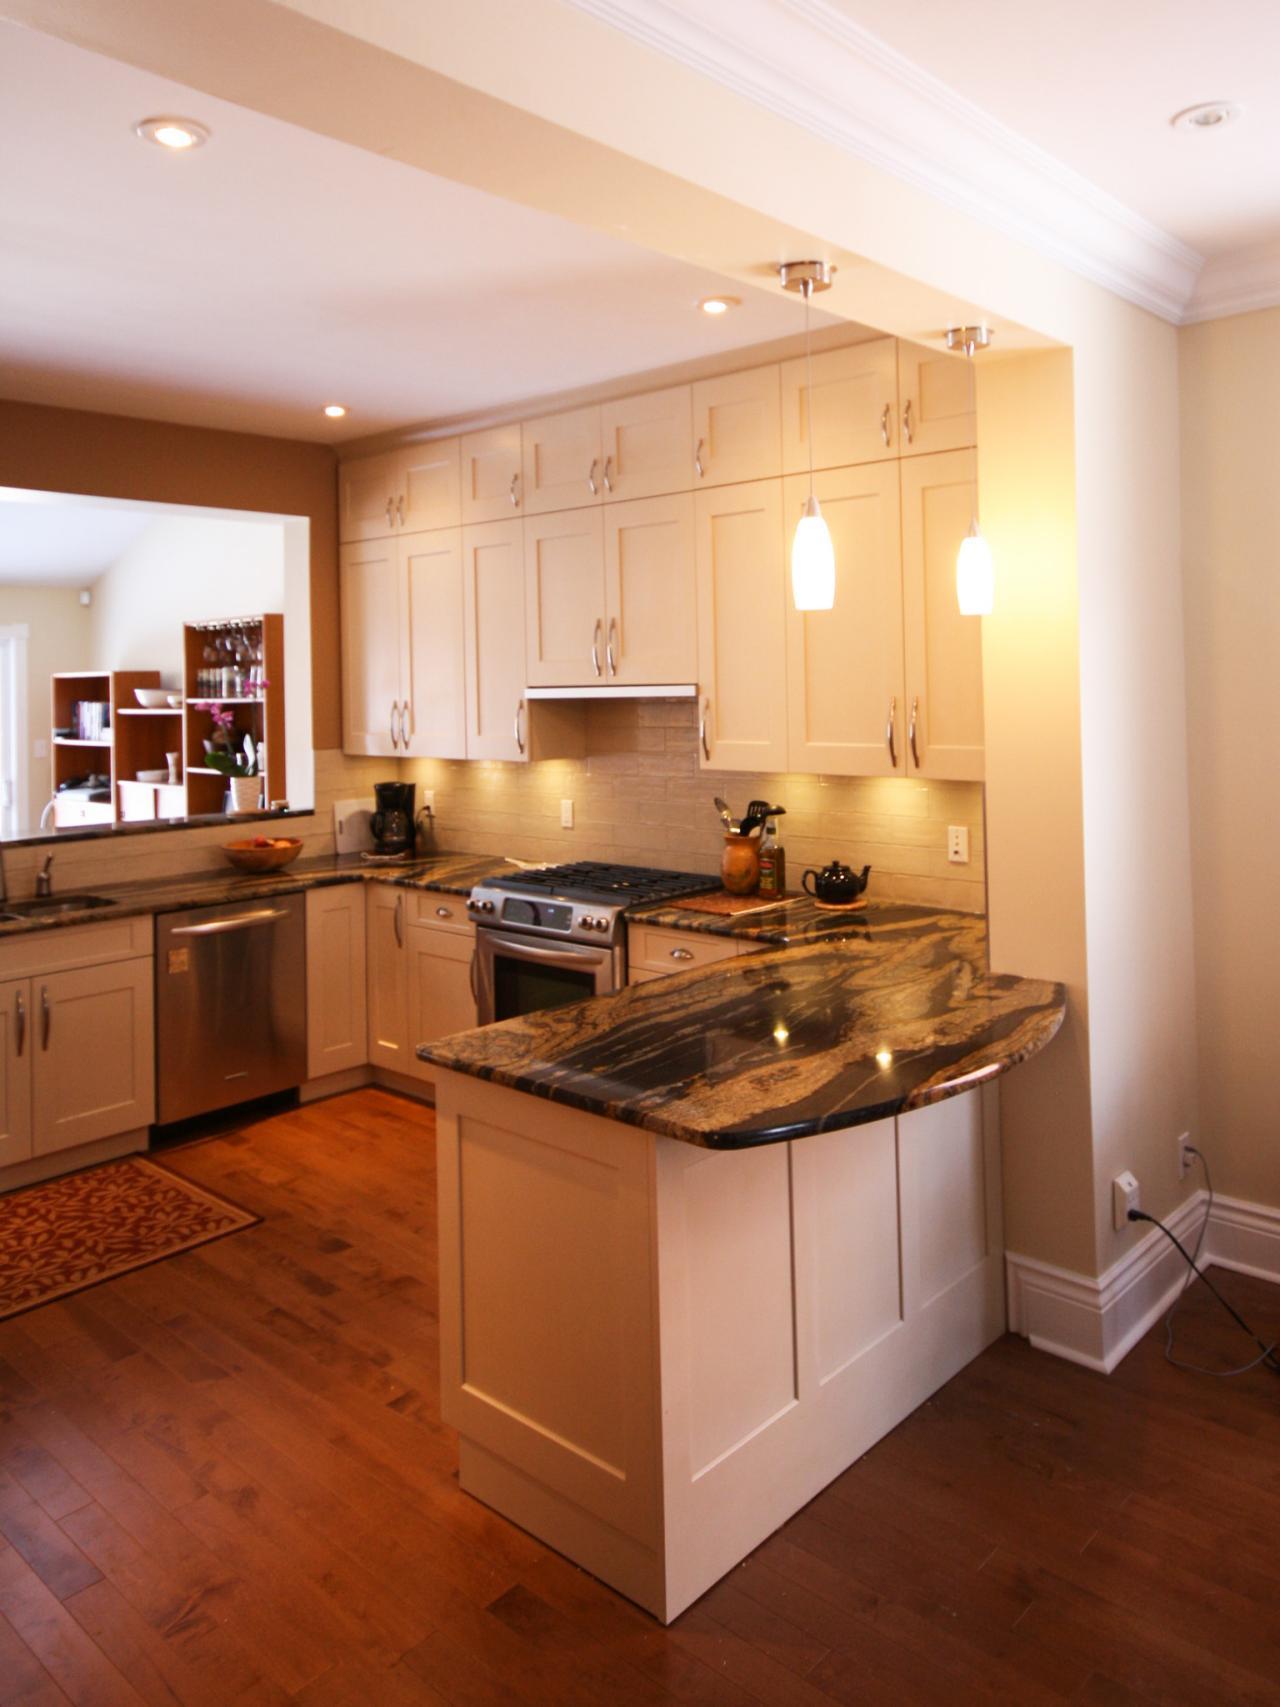 UShaped Kitchen Design Ideas Pictures  Ideas From HGTV HGTV - U shaped modern kitchen designs